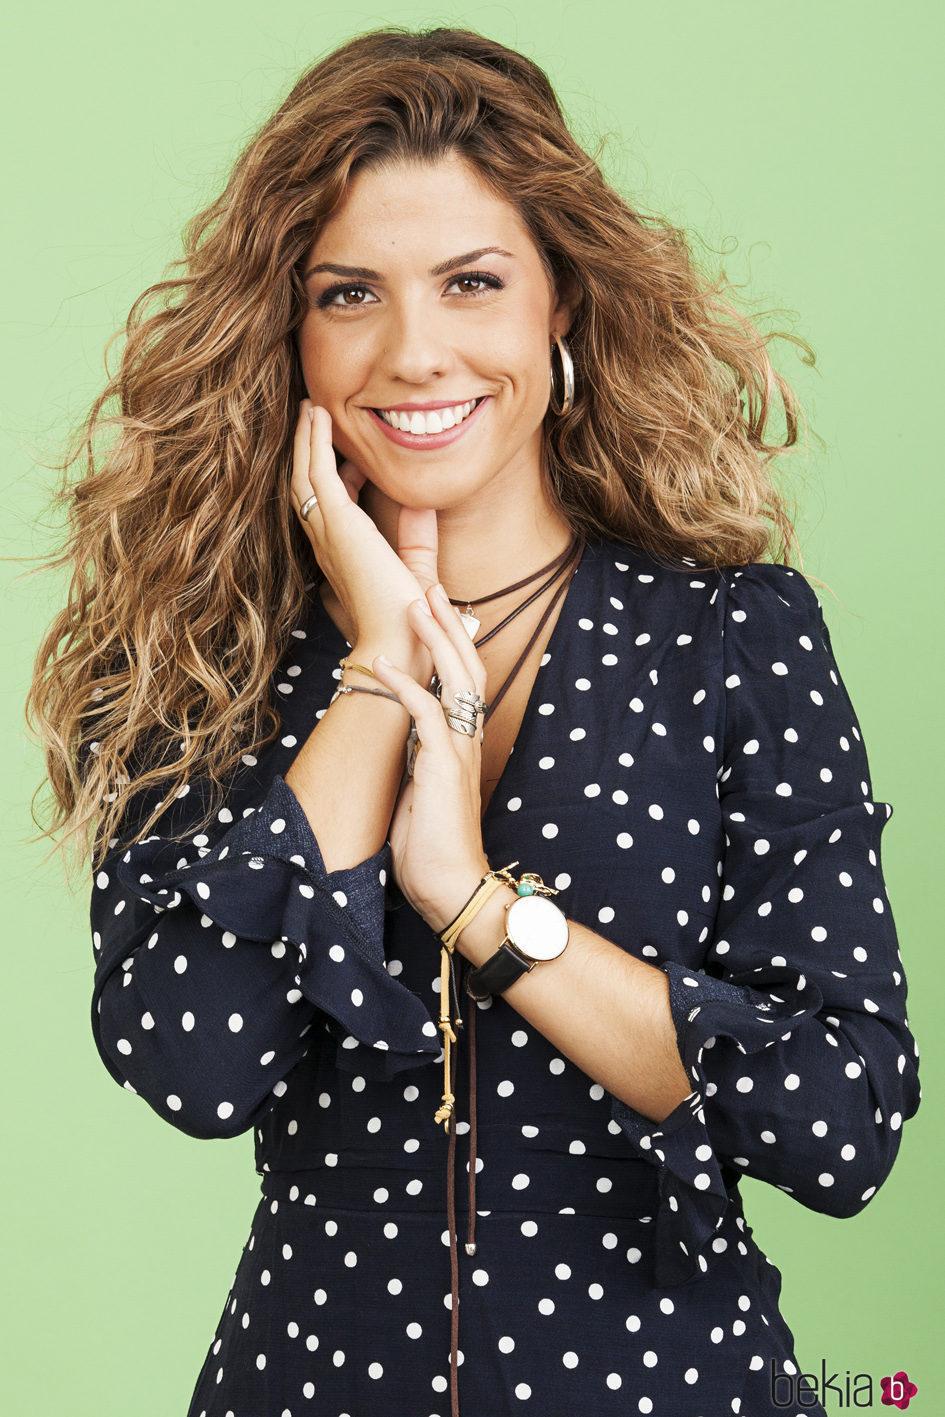 Miriam Rodríguez, concursante de 'Operación Triunfo 2017'